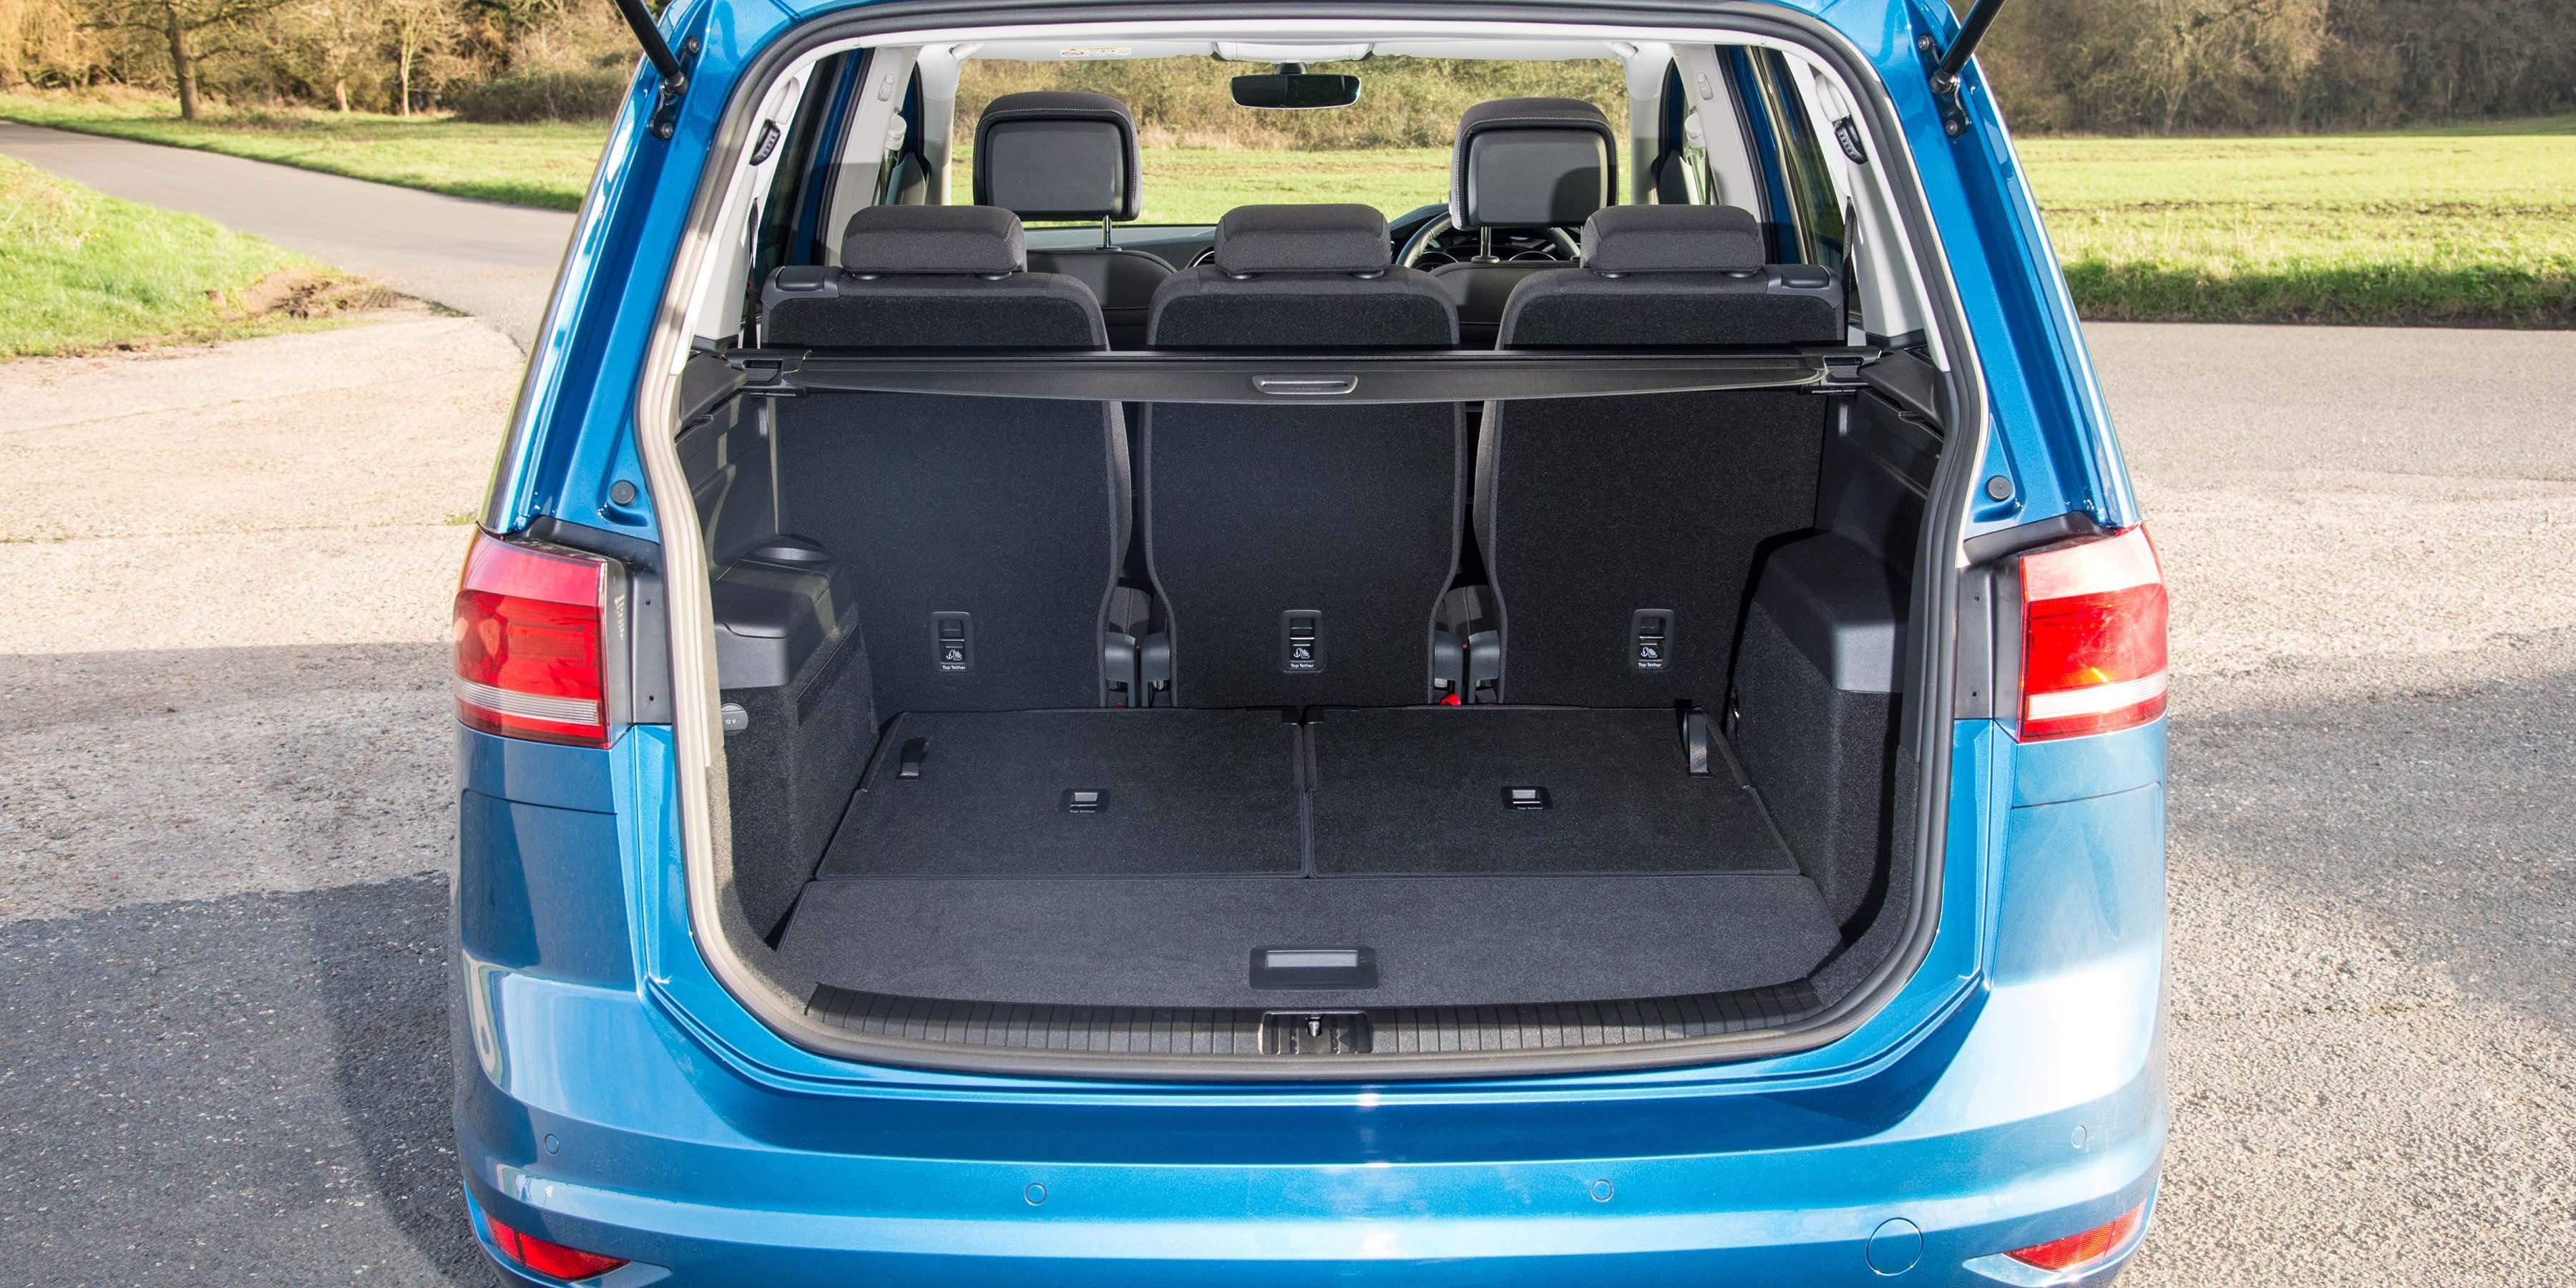 Turan Volkswagen Volkswagen Touran Review Carwow Opinions